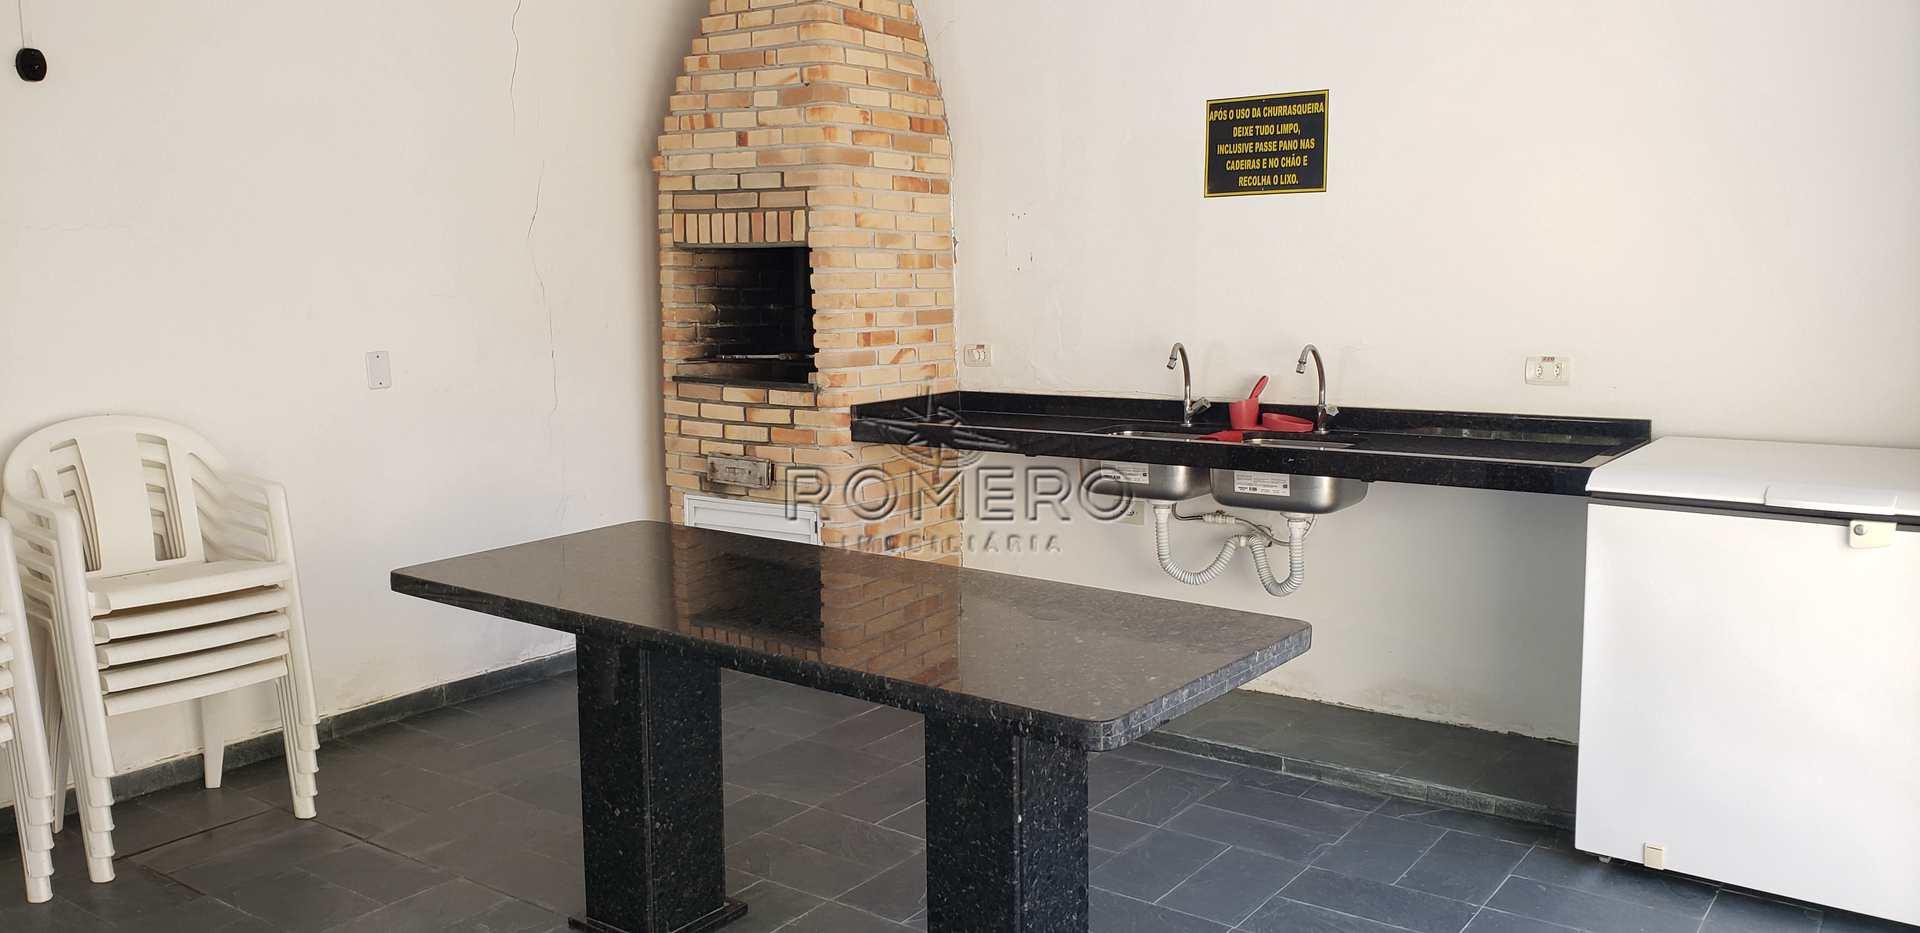 Apartamento com 2 dorms, Praia da Maranduba, Ubatuba - R$ 400 mil, Cod: 1494